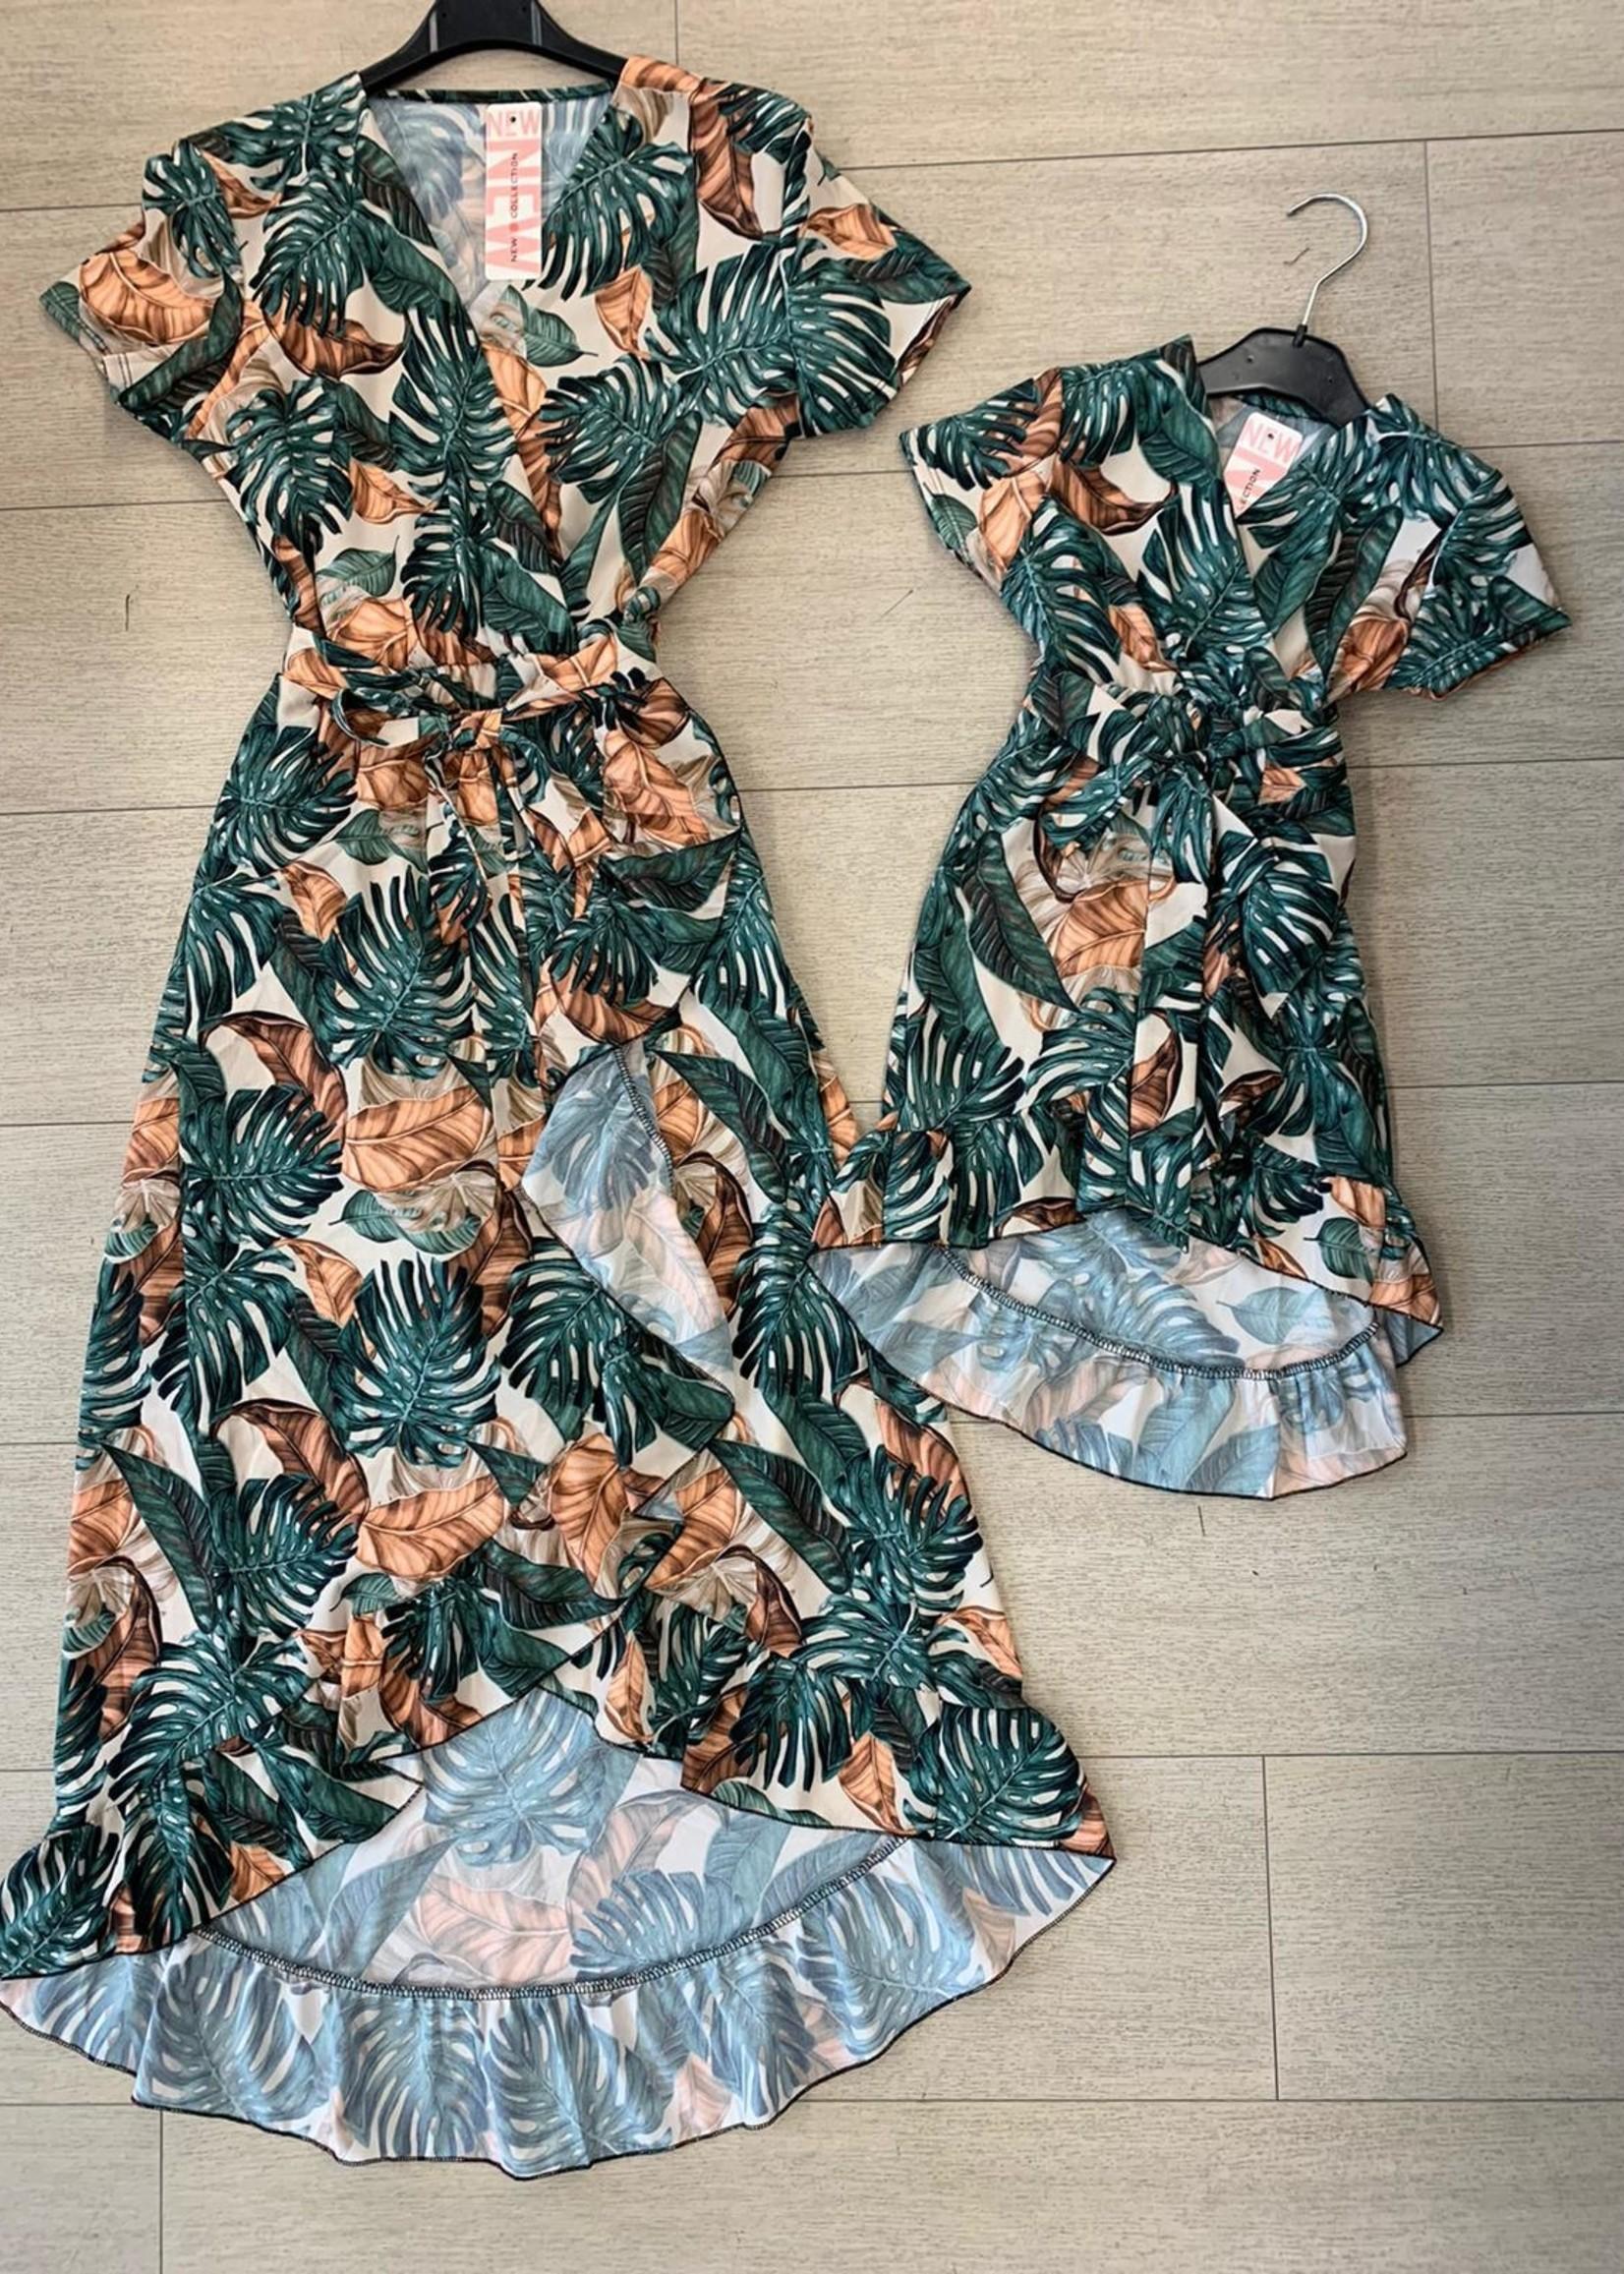 Divanis Divanis moeder bladprint dress